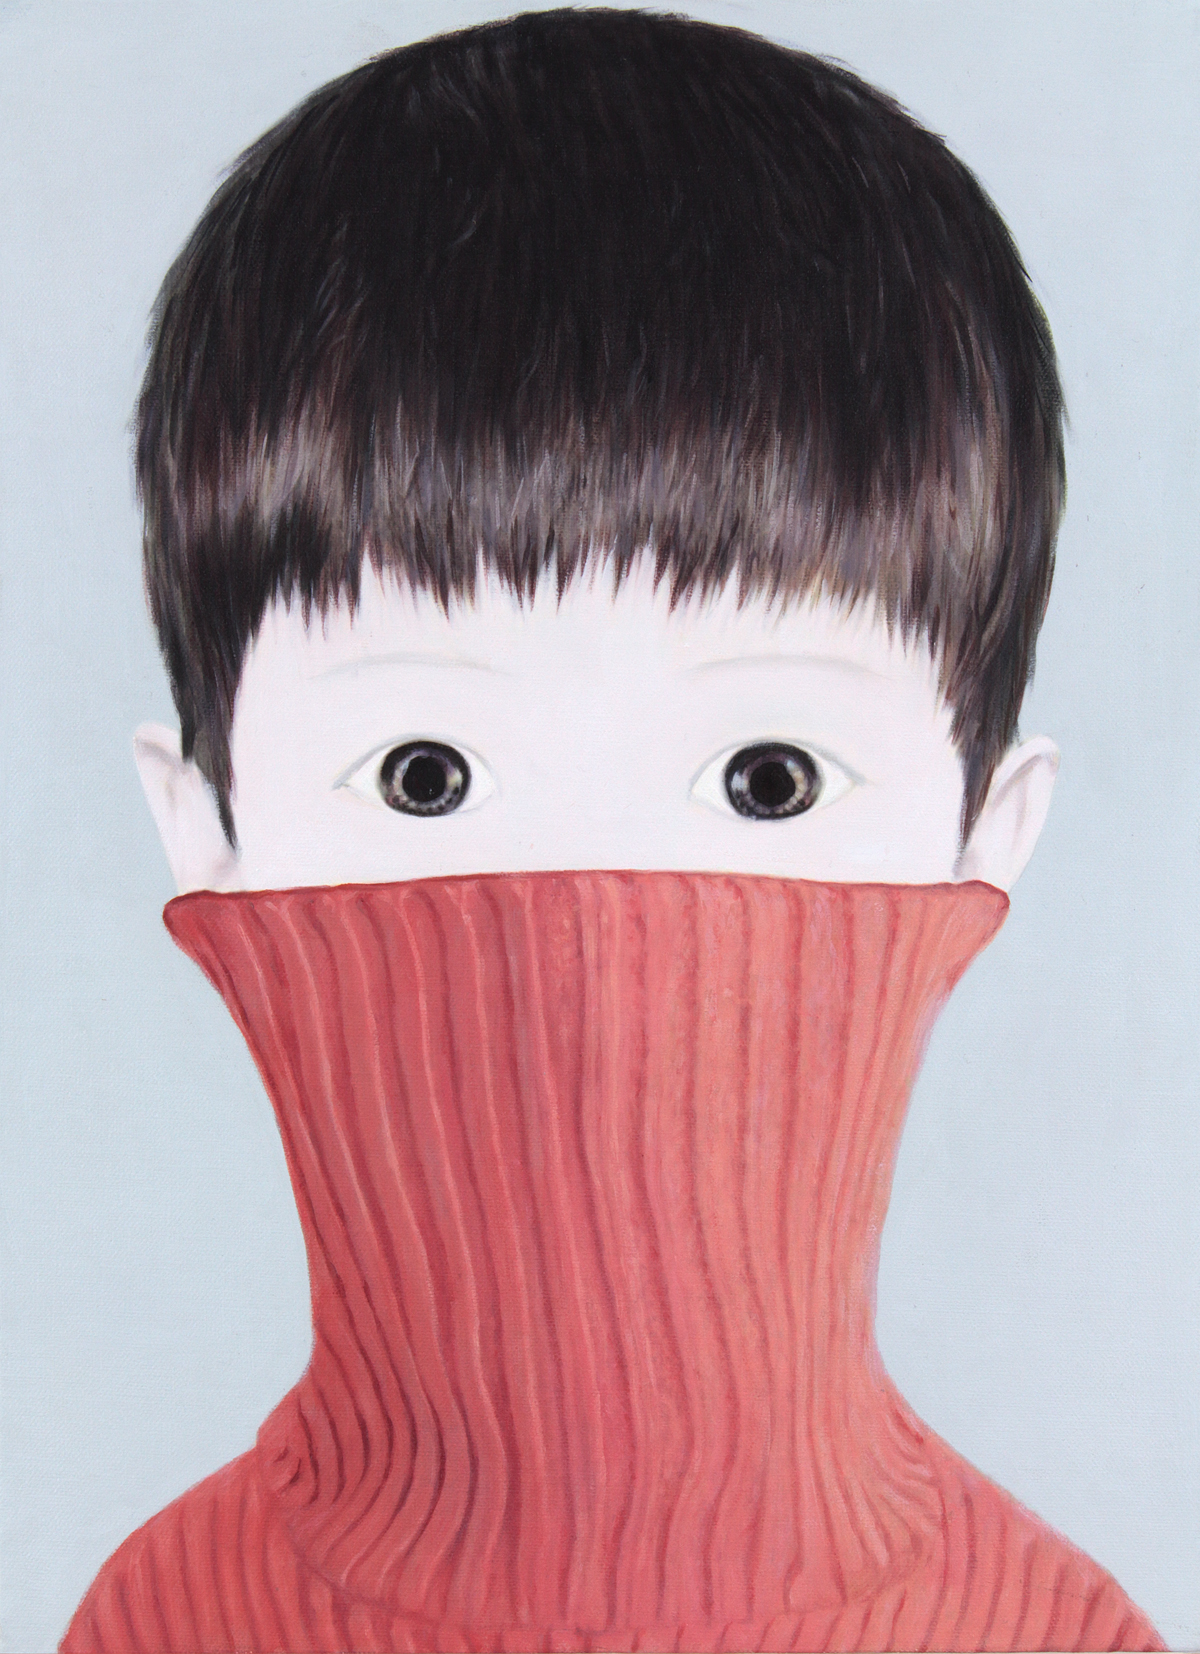 KALLENBACH - Mayuka Yamamoto - red sweater (2014).jpg